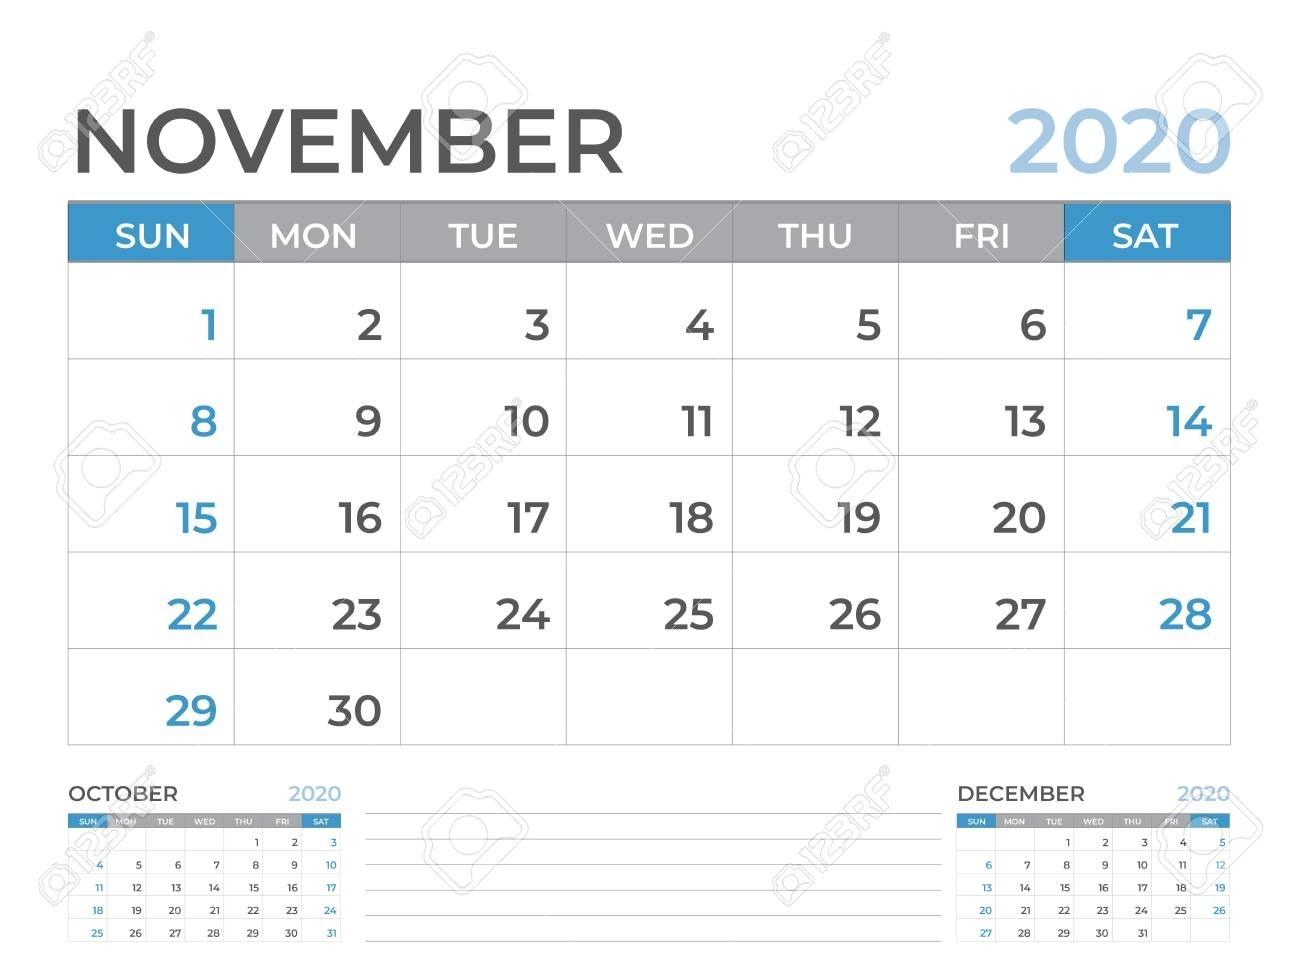 November 2020 Calendar Template, Desk Calendar Layout Size 8.. within 8 X 10 Calendar 2020